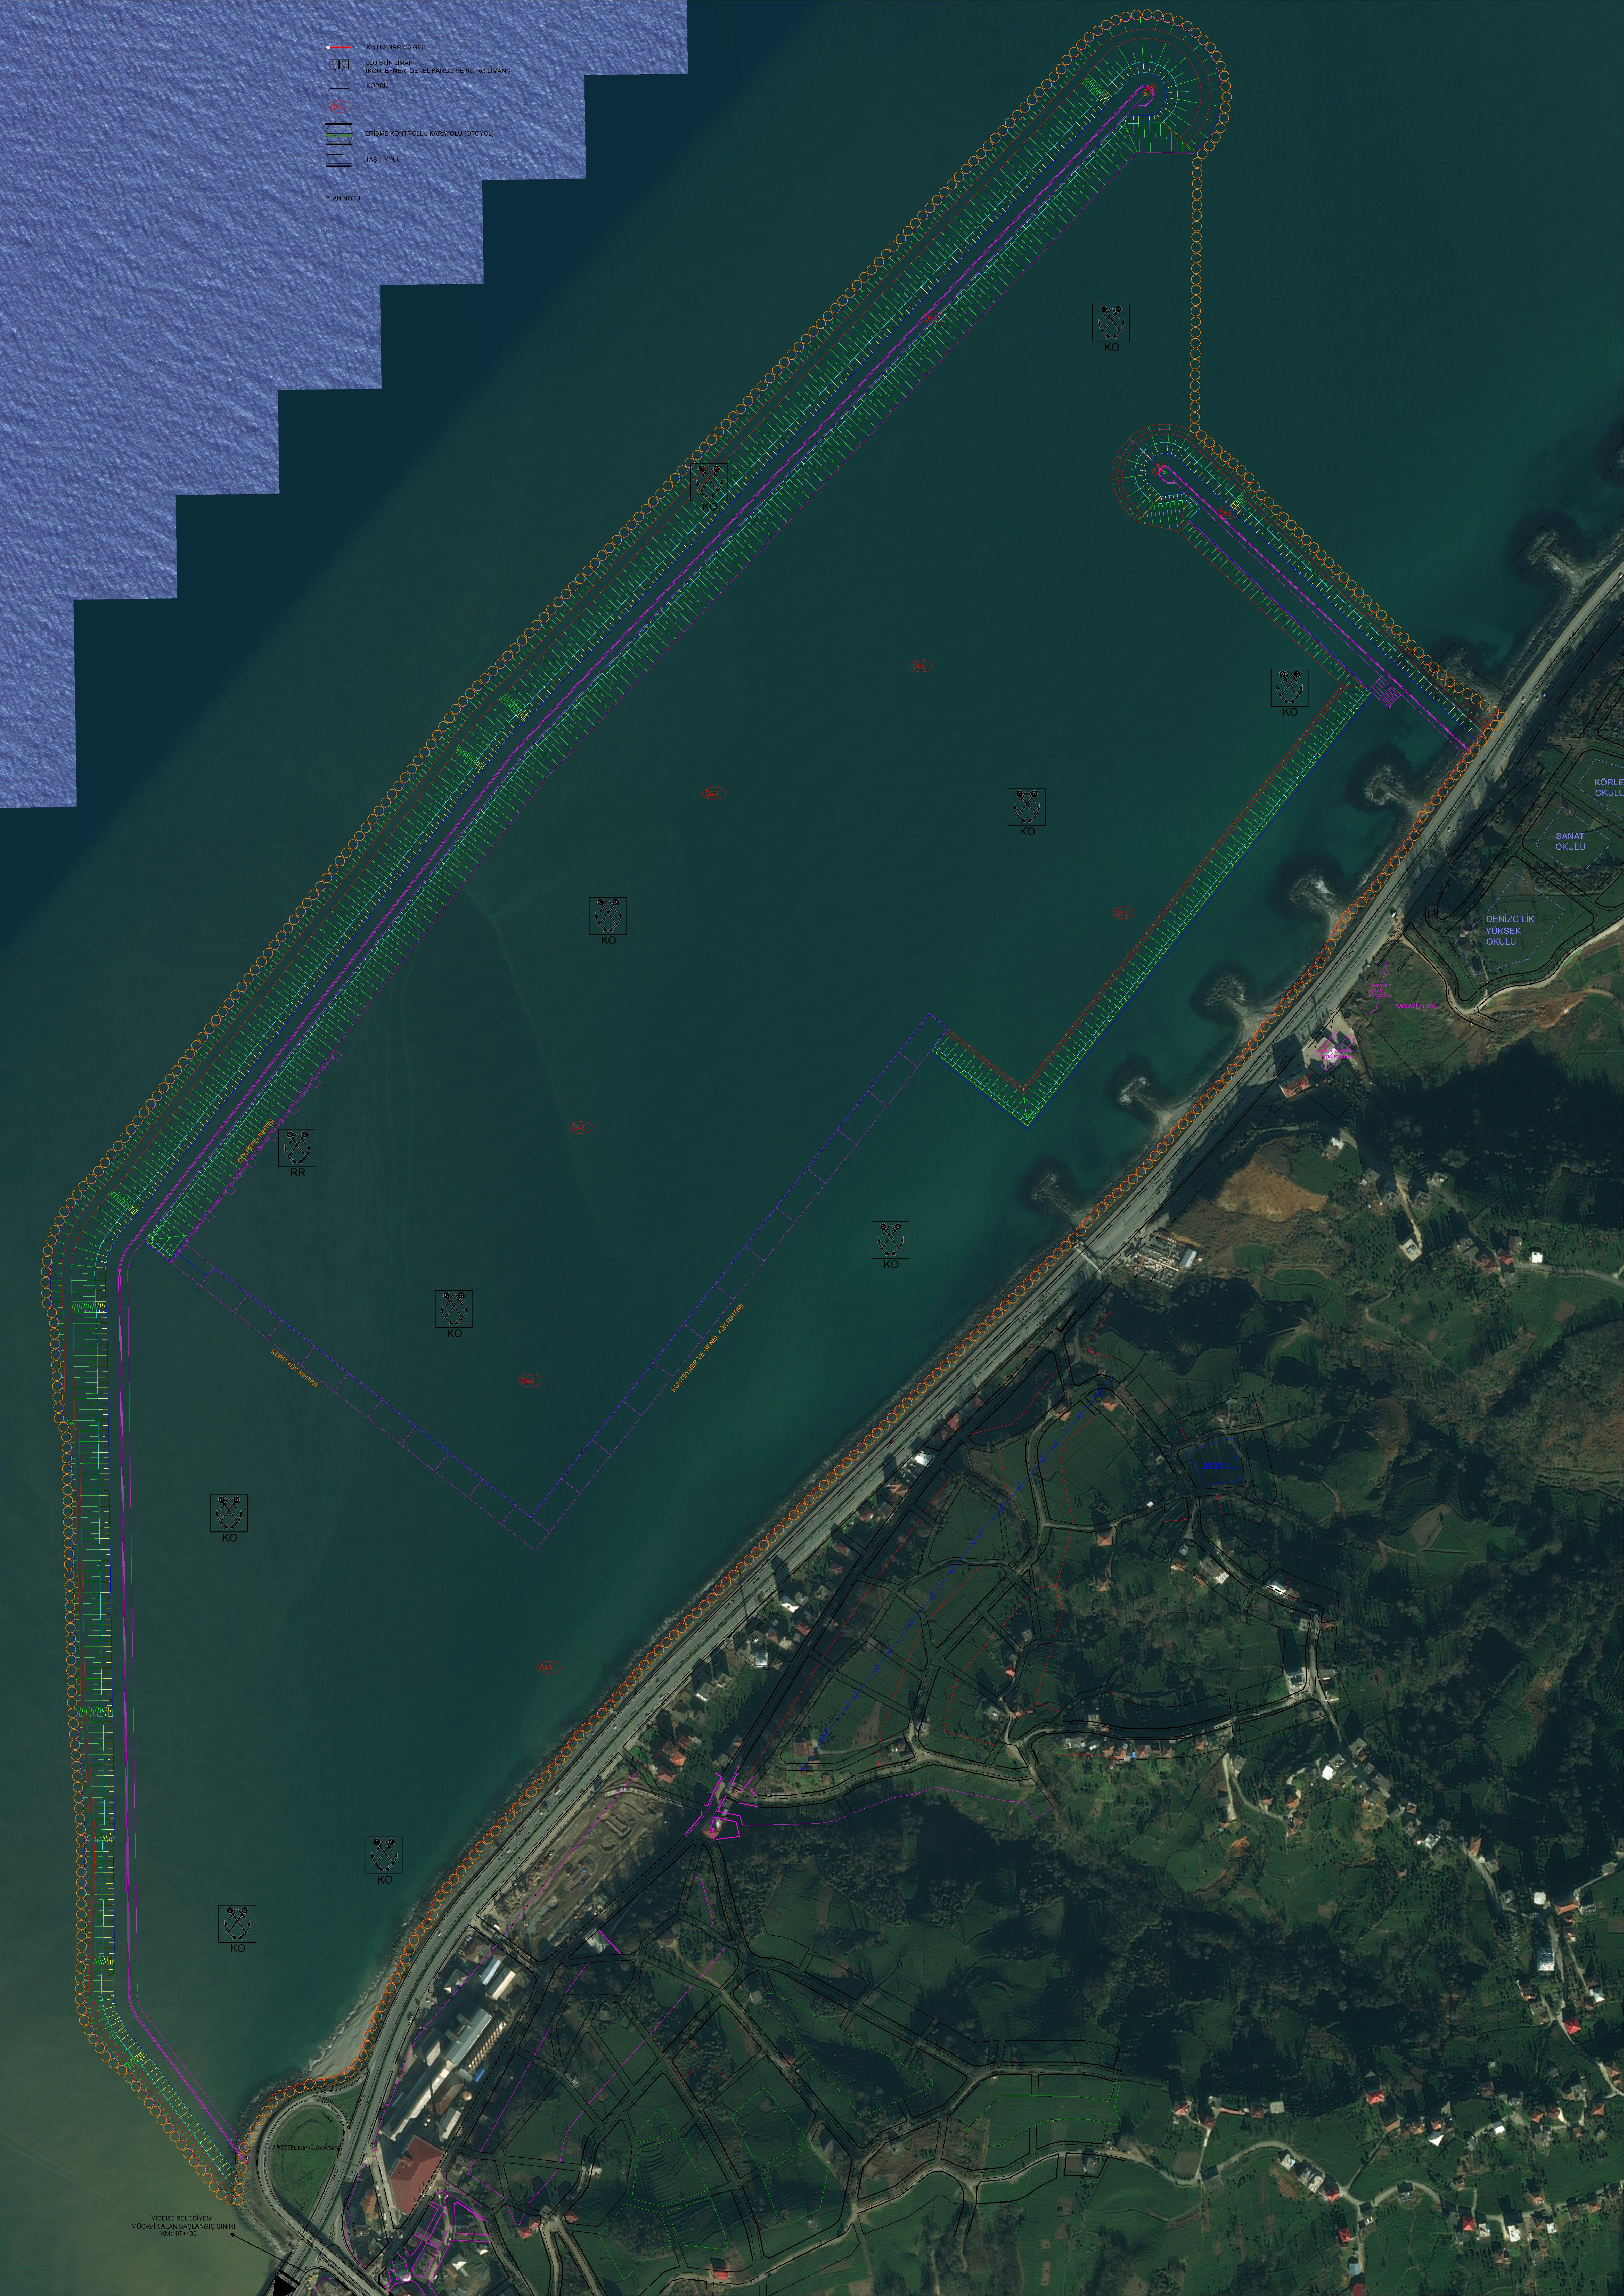 İYİDERE İLÇESİ LOJİSTİK LİMANI (Konteyner, Genel Kargo ve Ro Ro Limanı) AMAÇLI DOLGU İMAR PLANI BAKANLIĞIMIZCA ONAYLANDI